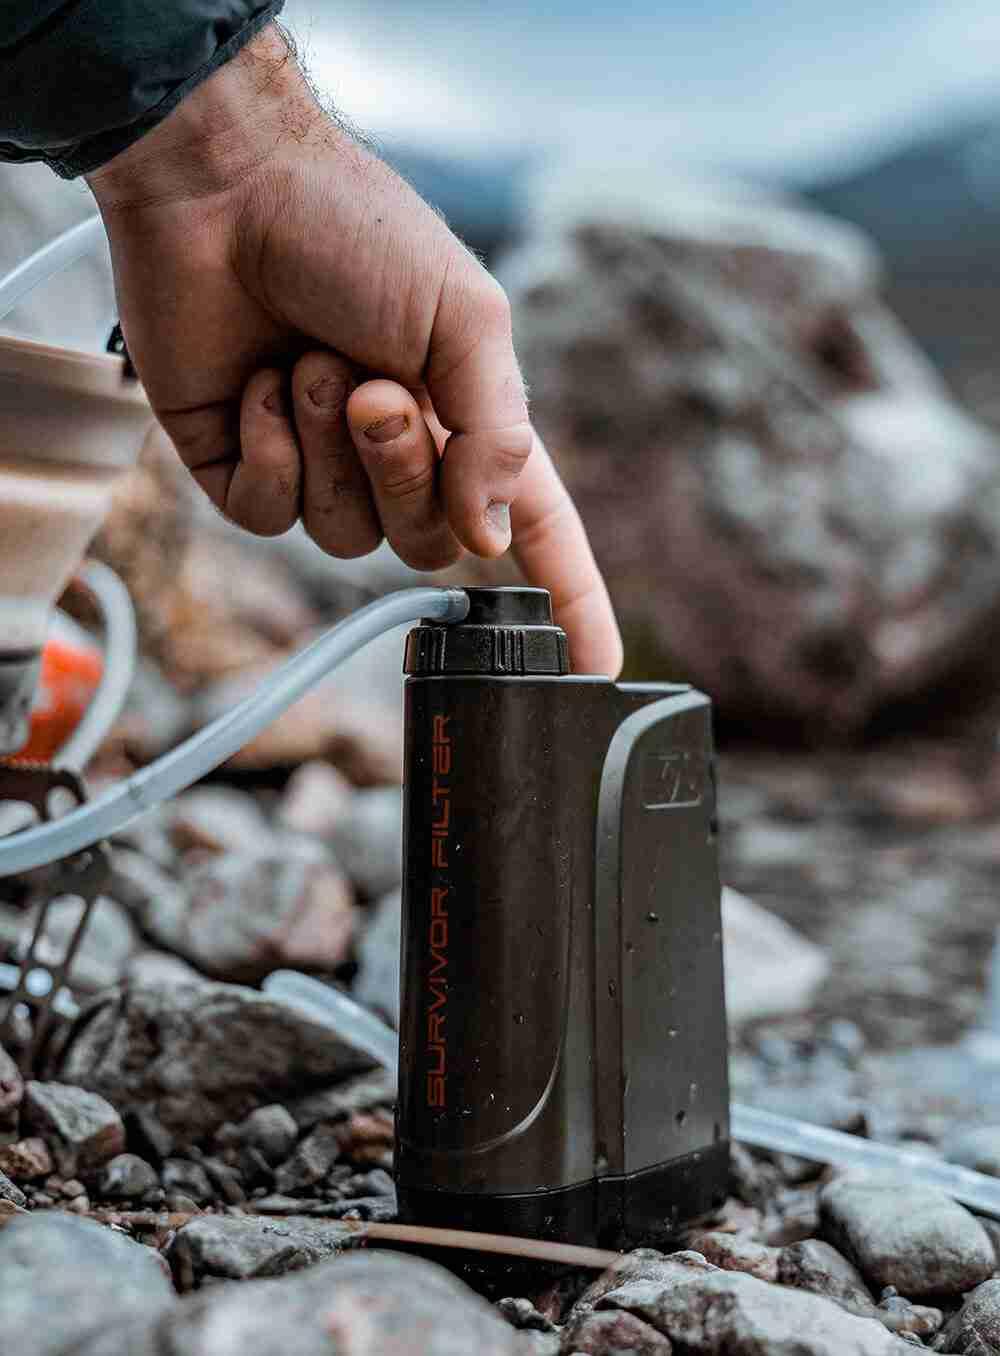 For the tech-savvy, modern adventurist Survivor Filter Electric PRO X